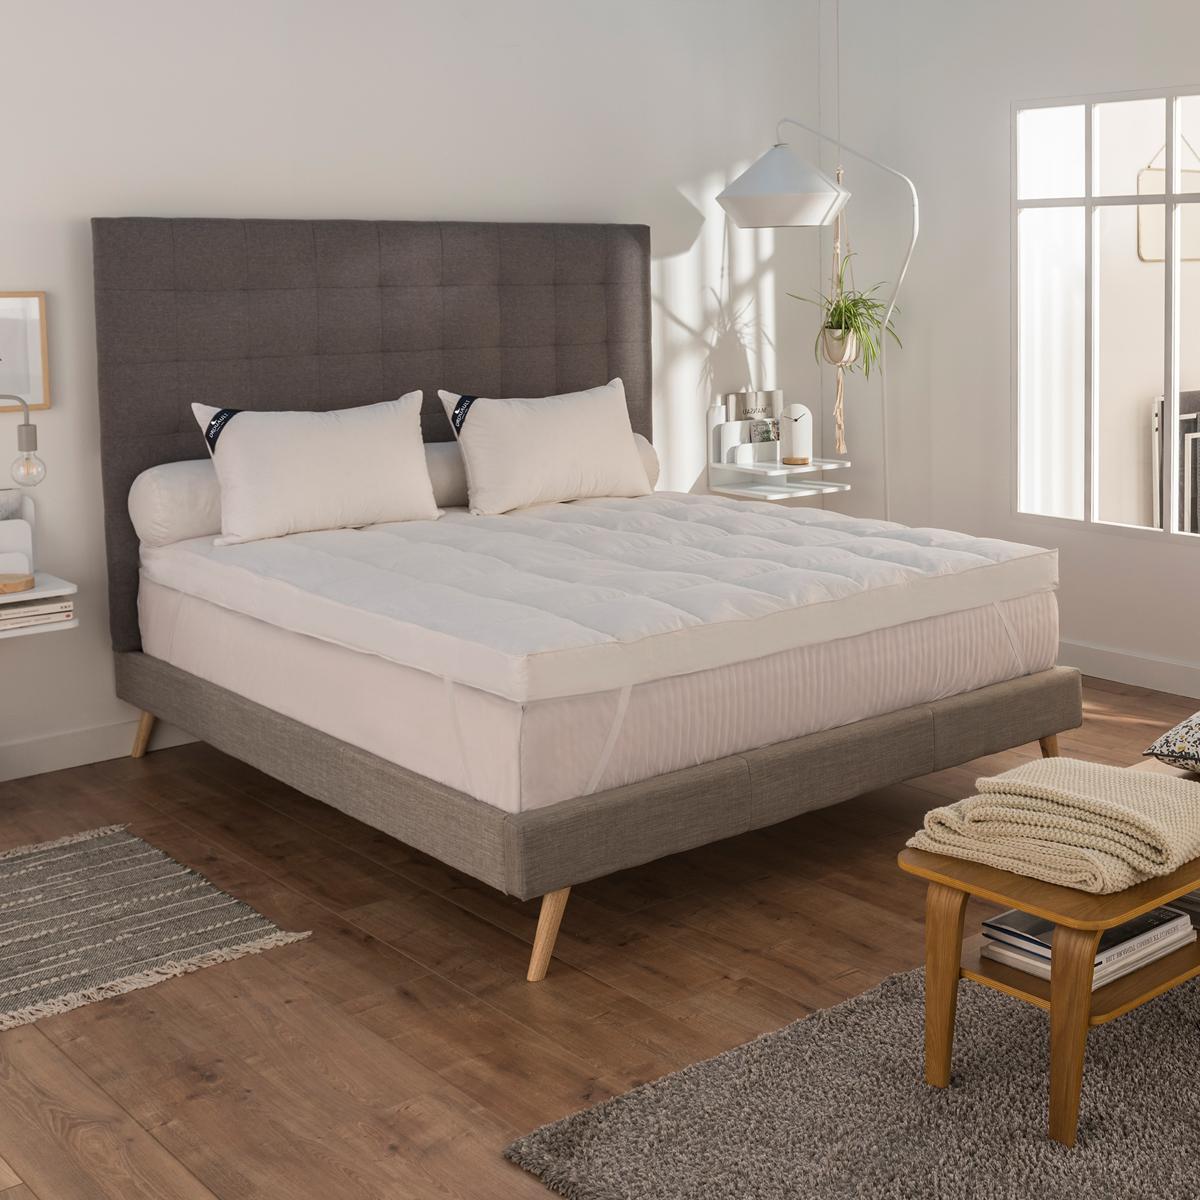 Surconfort de Matelas Haut Luxe Pro 160x200 cm